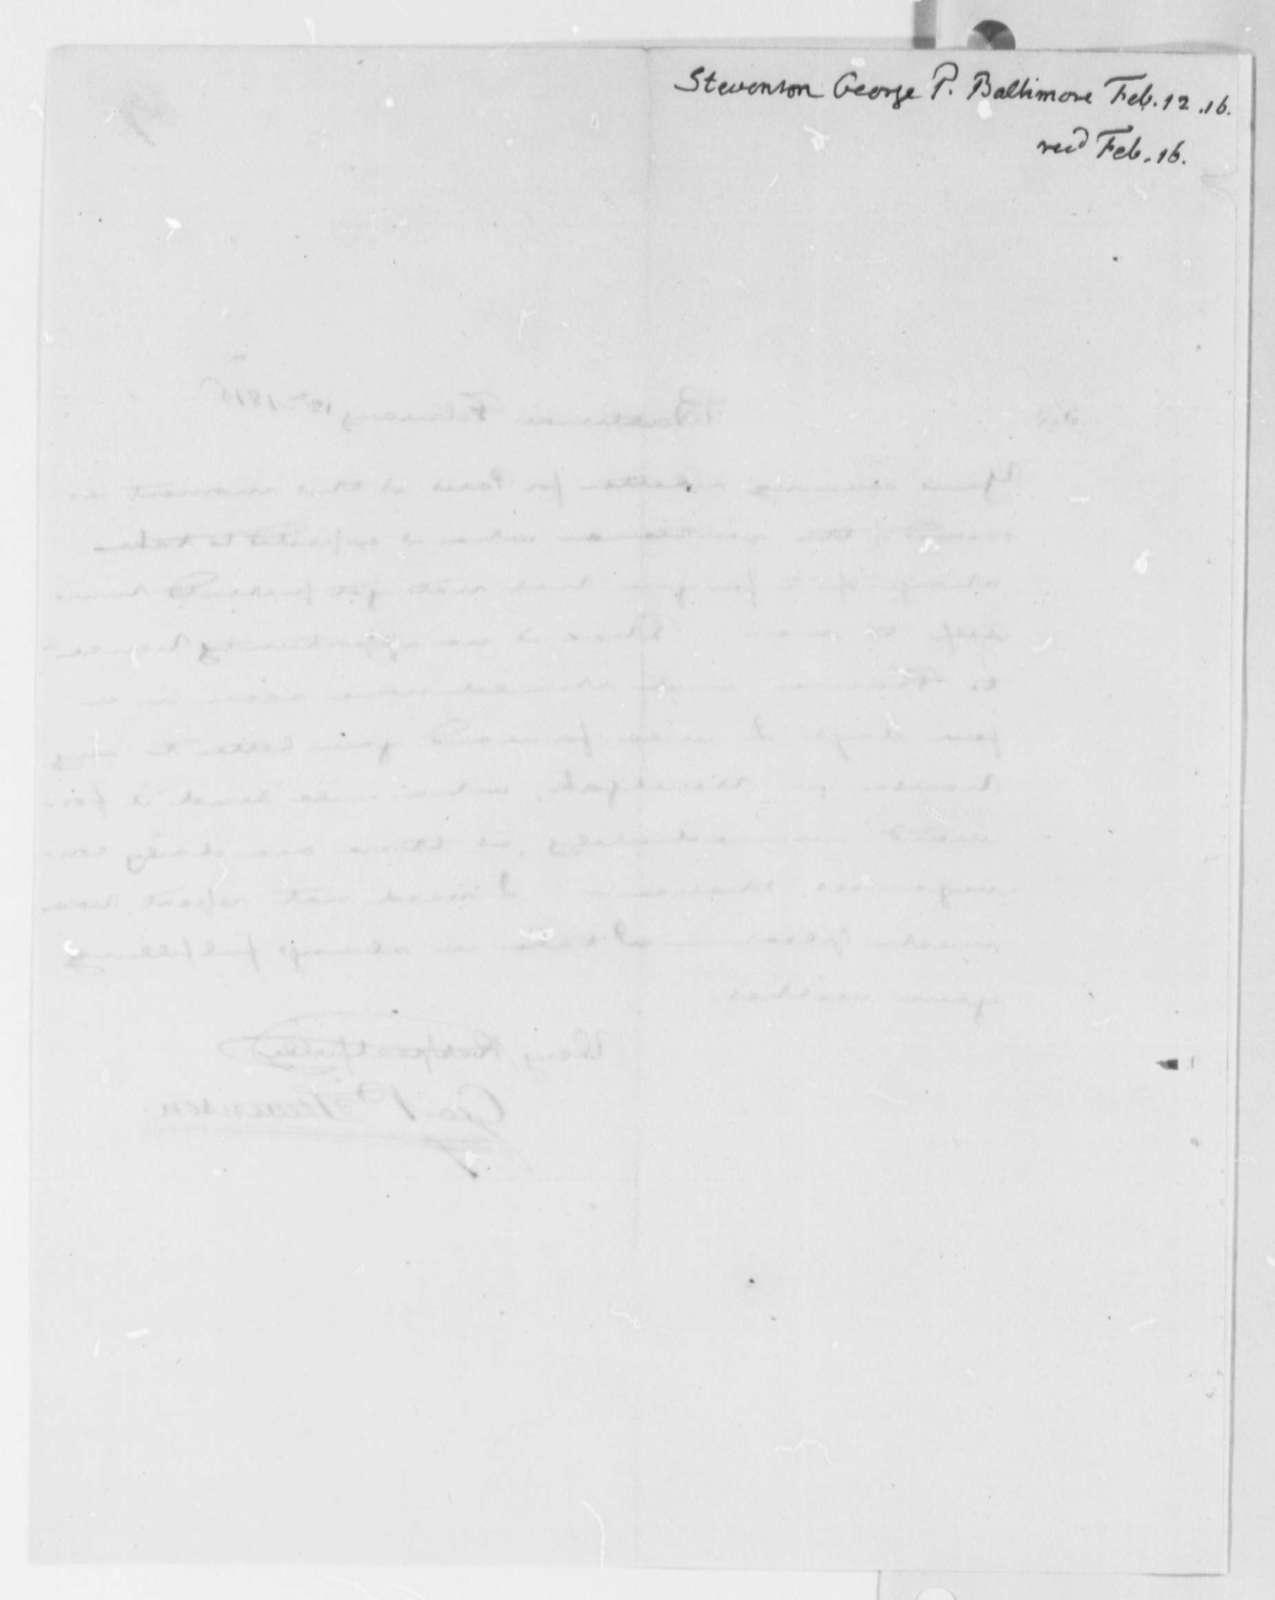 George P. Stevenson to Thomas Jefferson, February 12, 1816